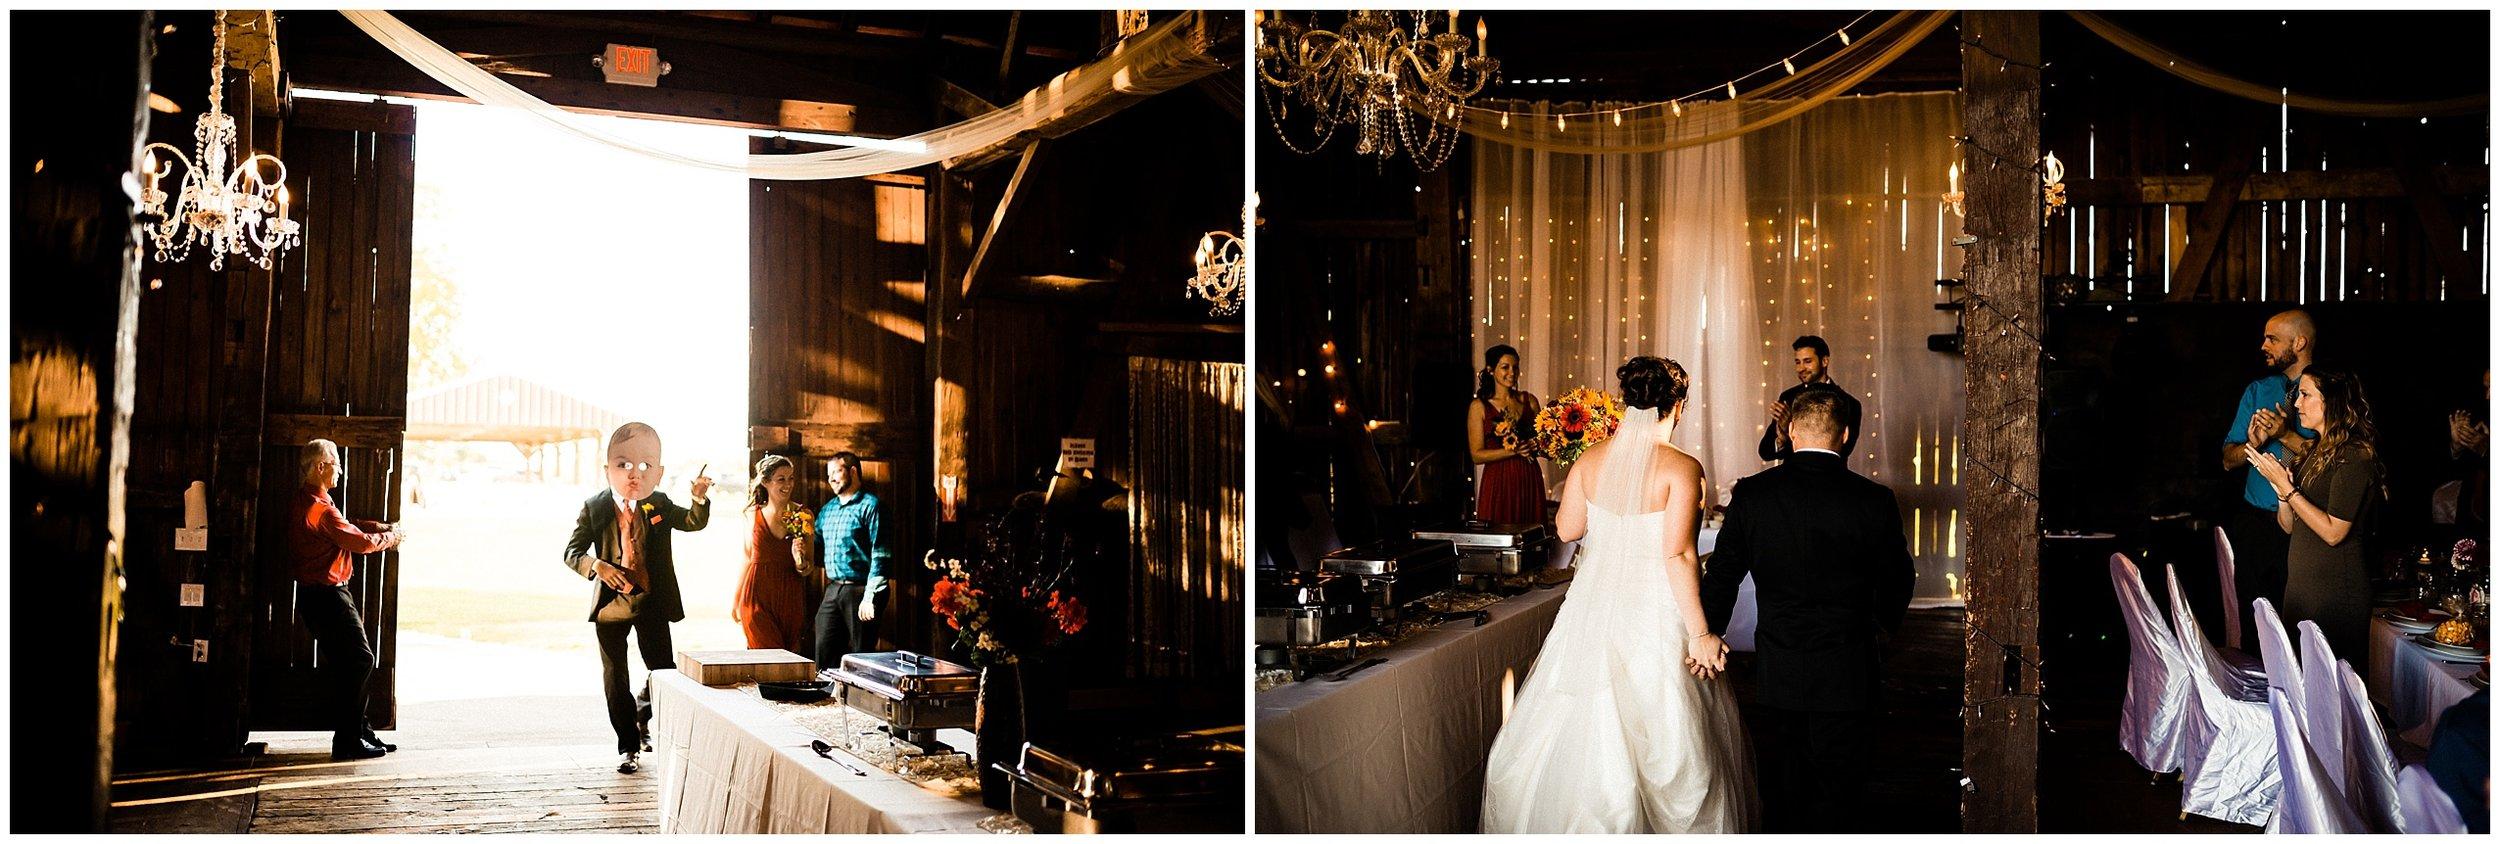 Micheal + Chelsie   Just Married #kyleepaigephotography_1602.jpg